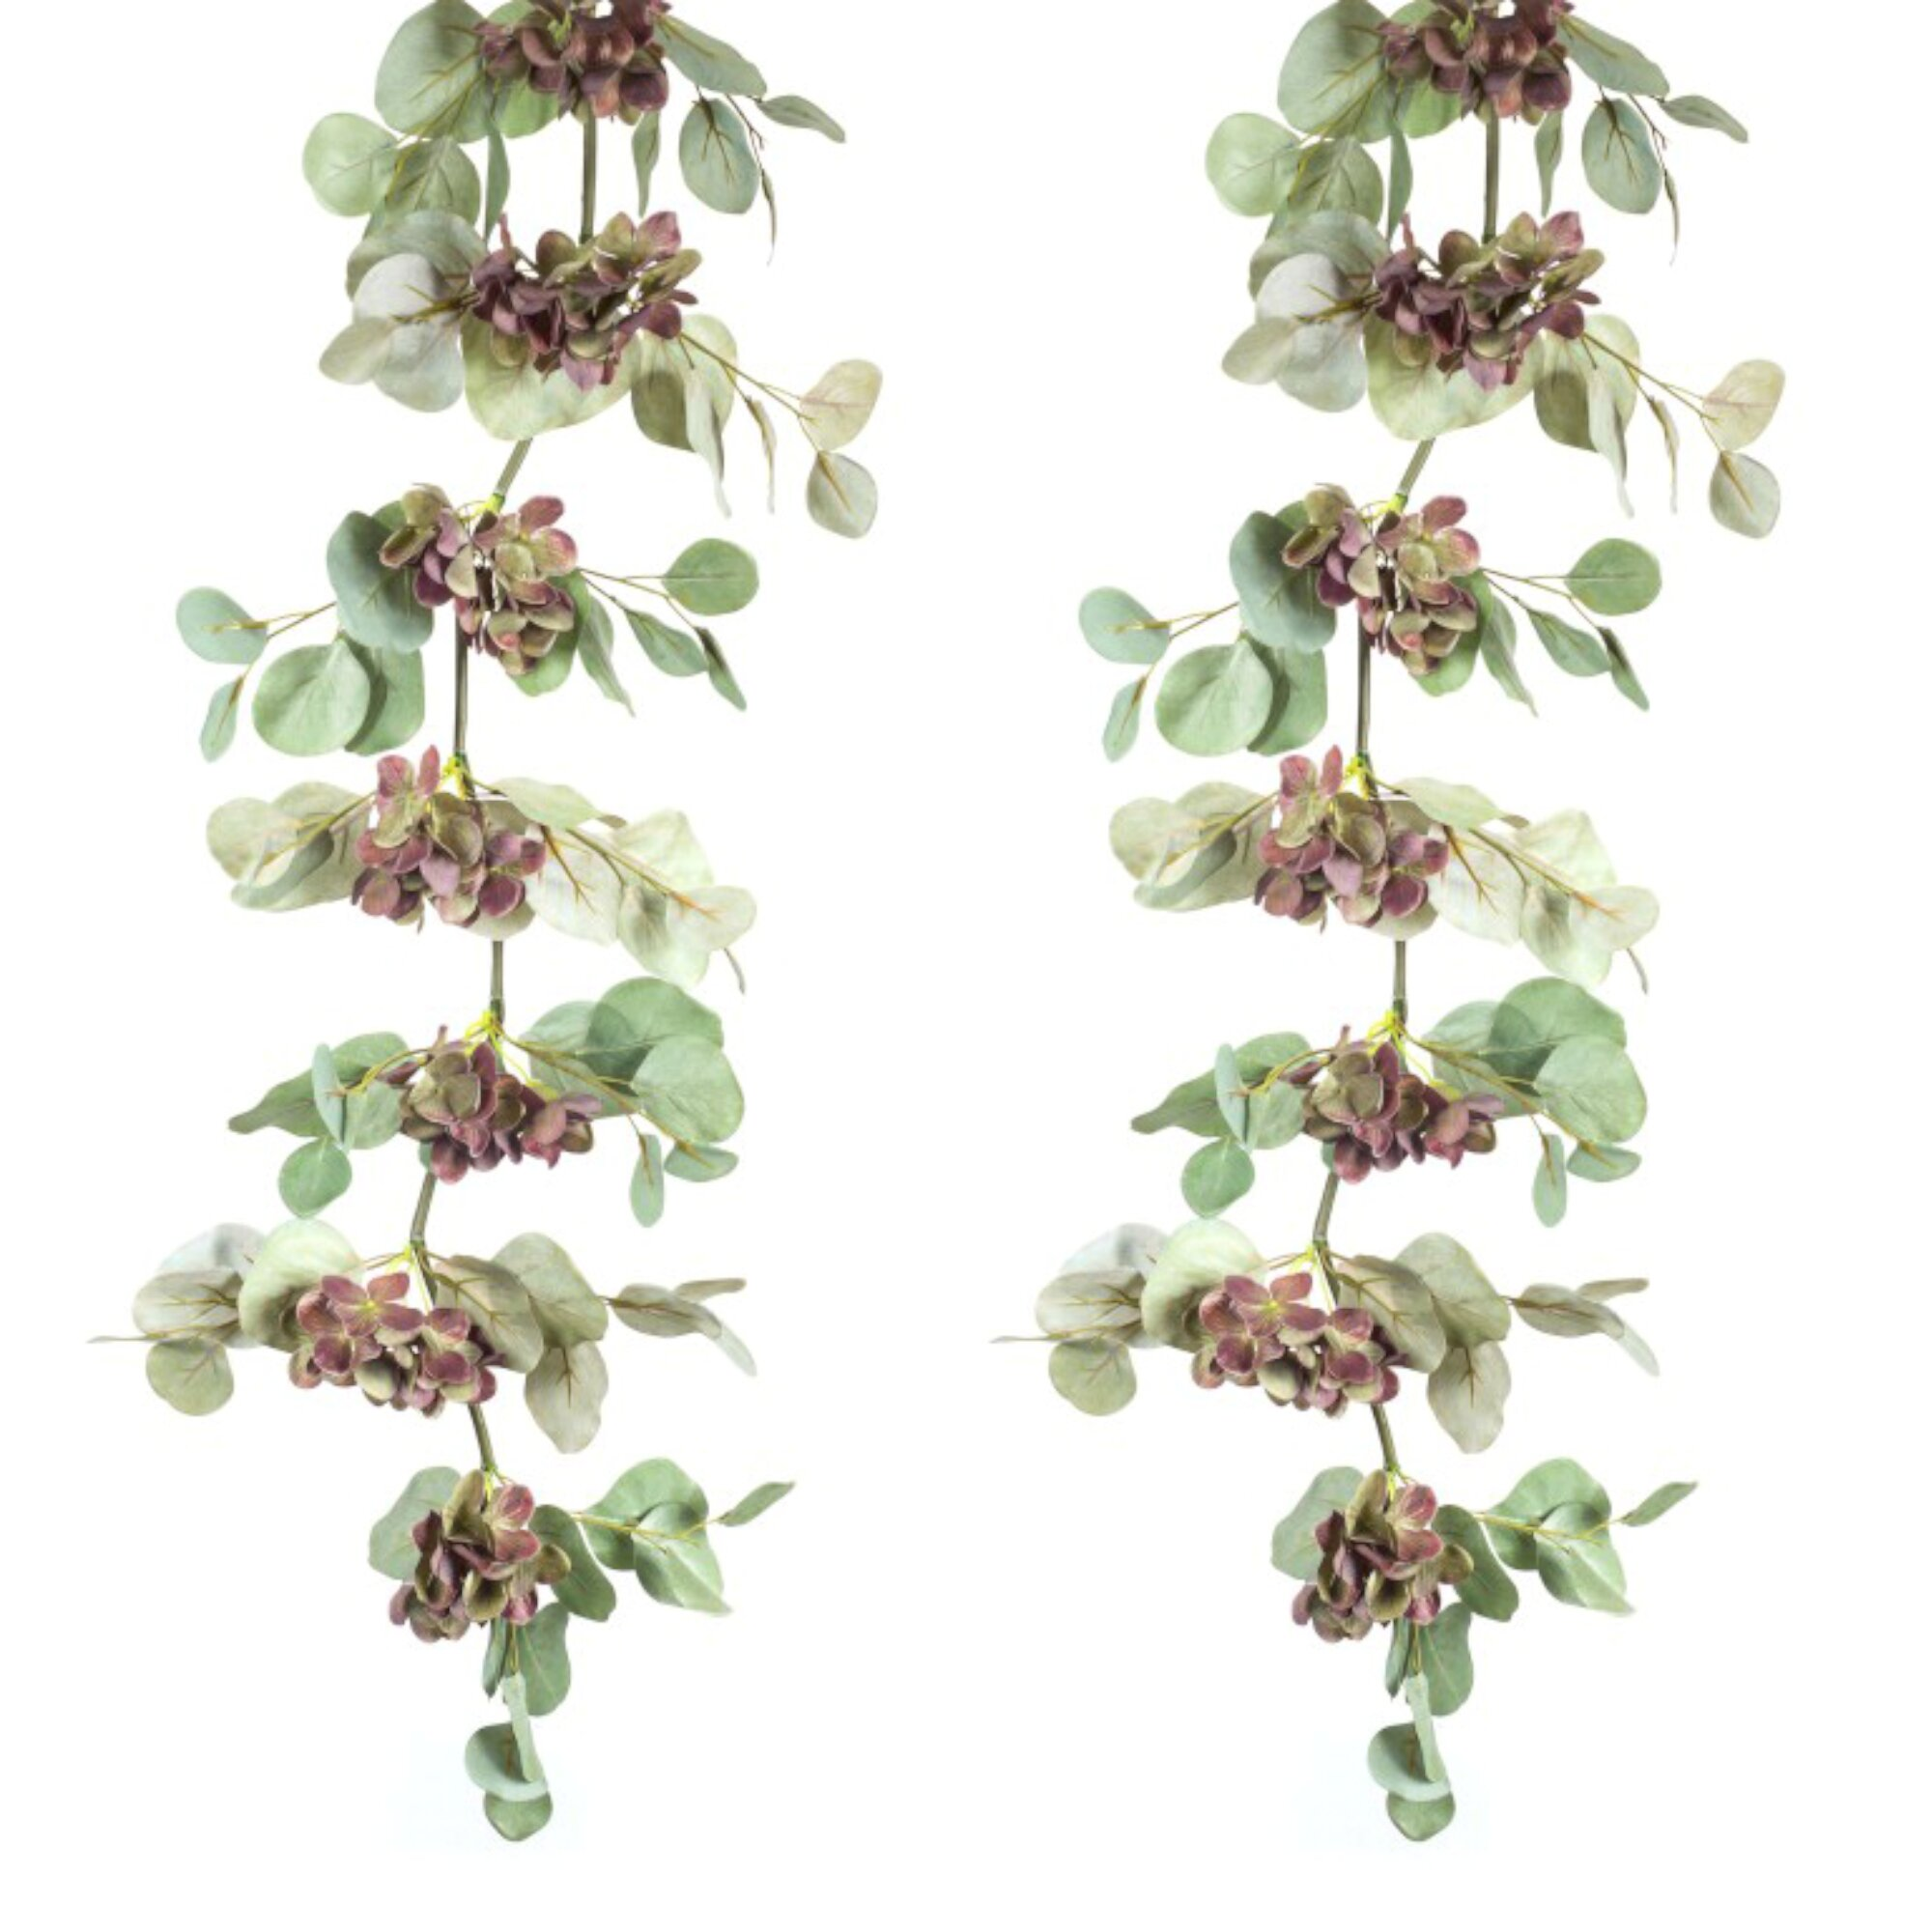 Ophelia Co Hydrangea Eucalyptus Garland Wayfair